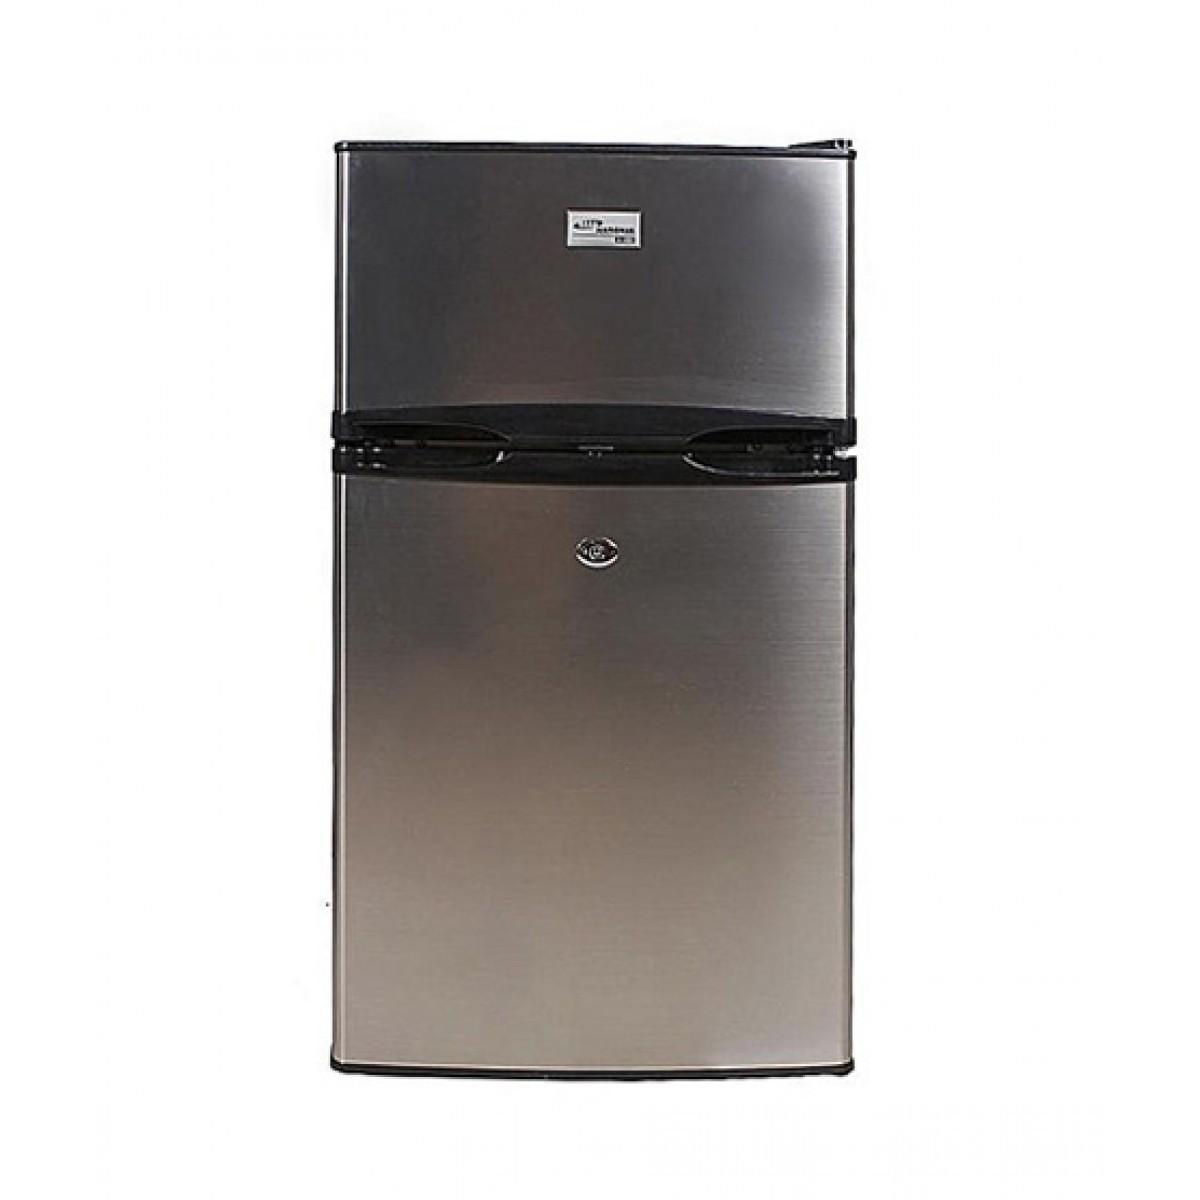 Gaba National Double Door Refrigerator (GNR-187SS)